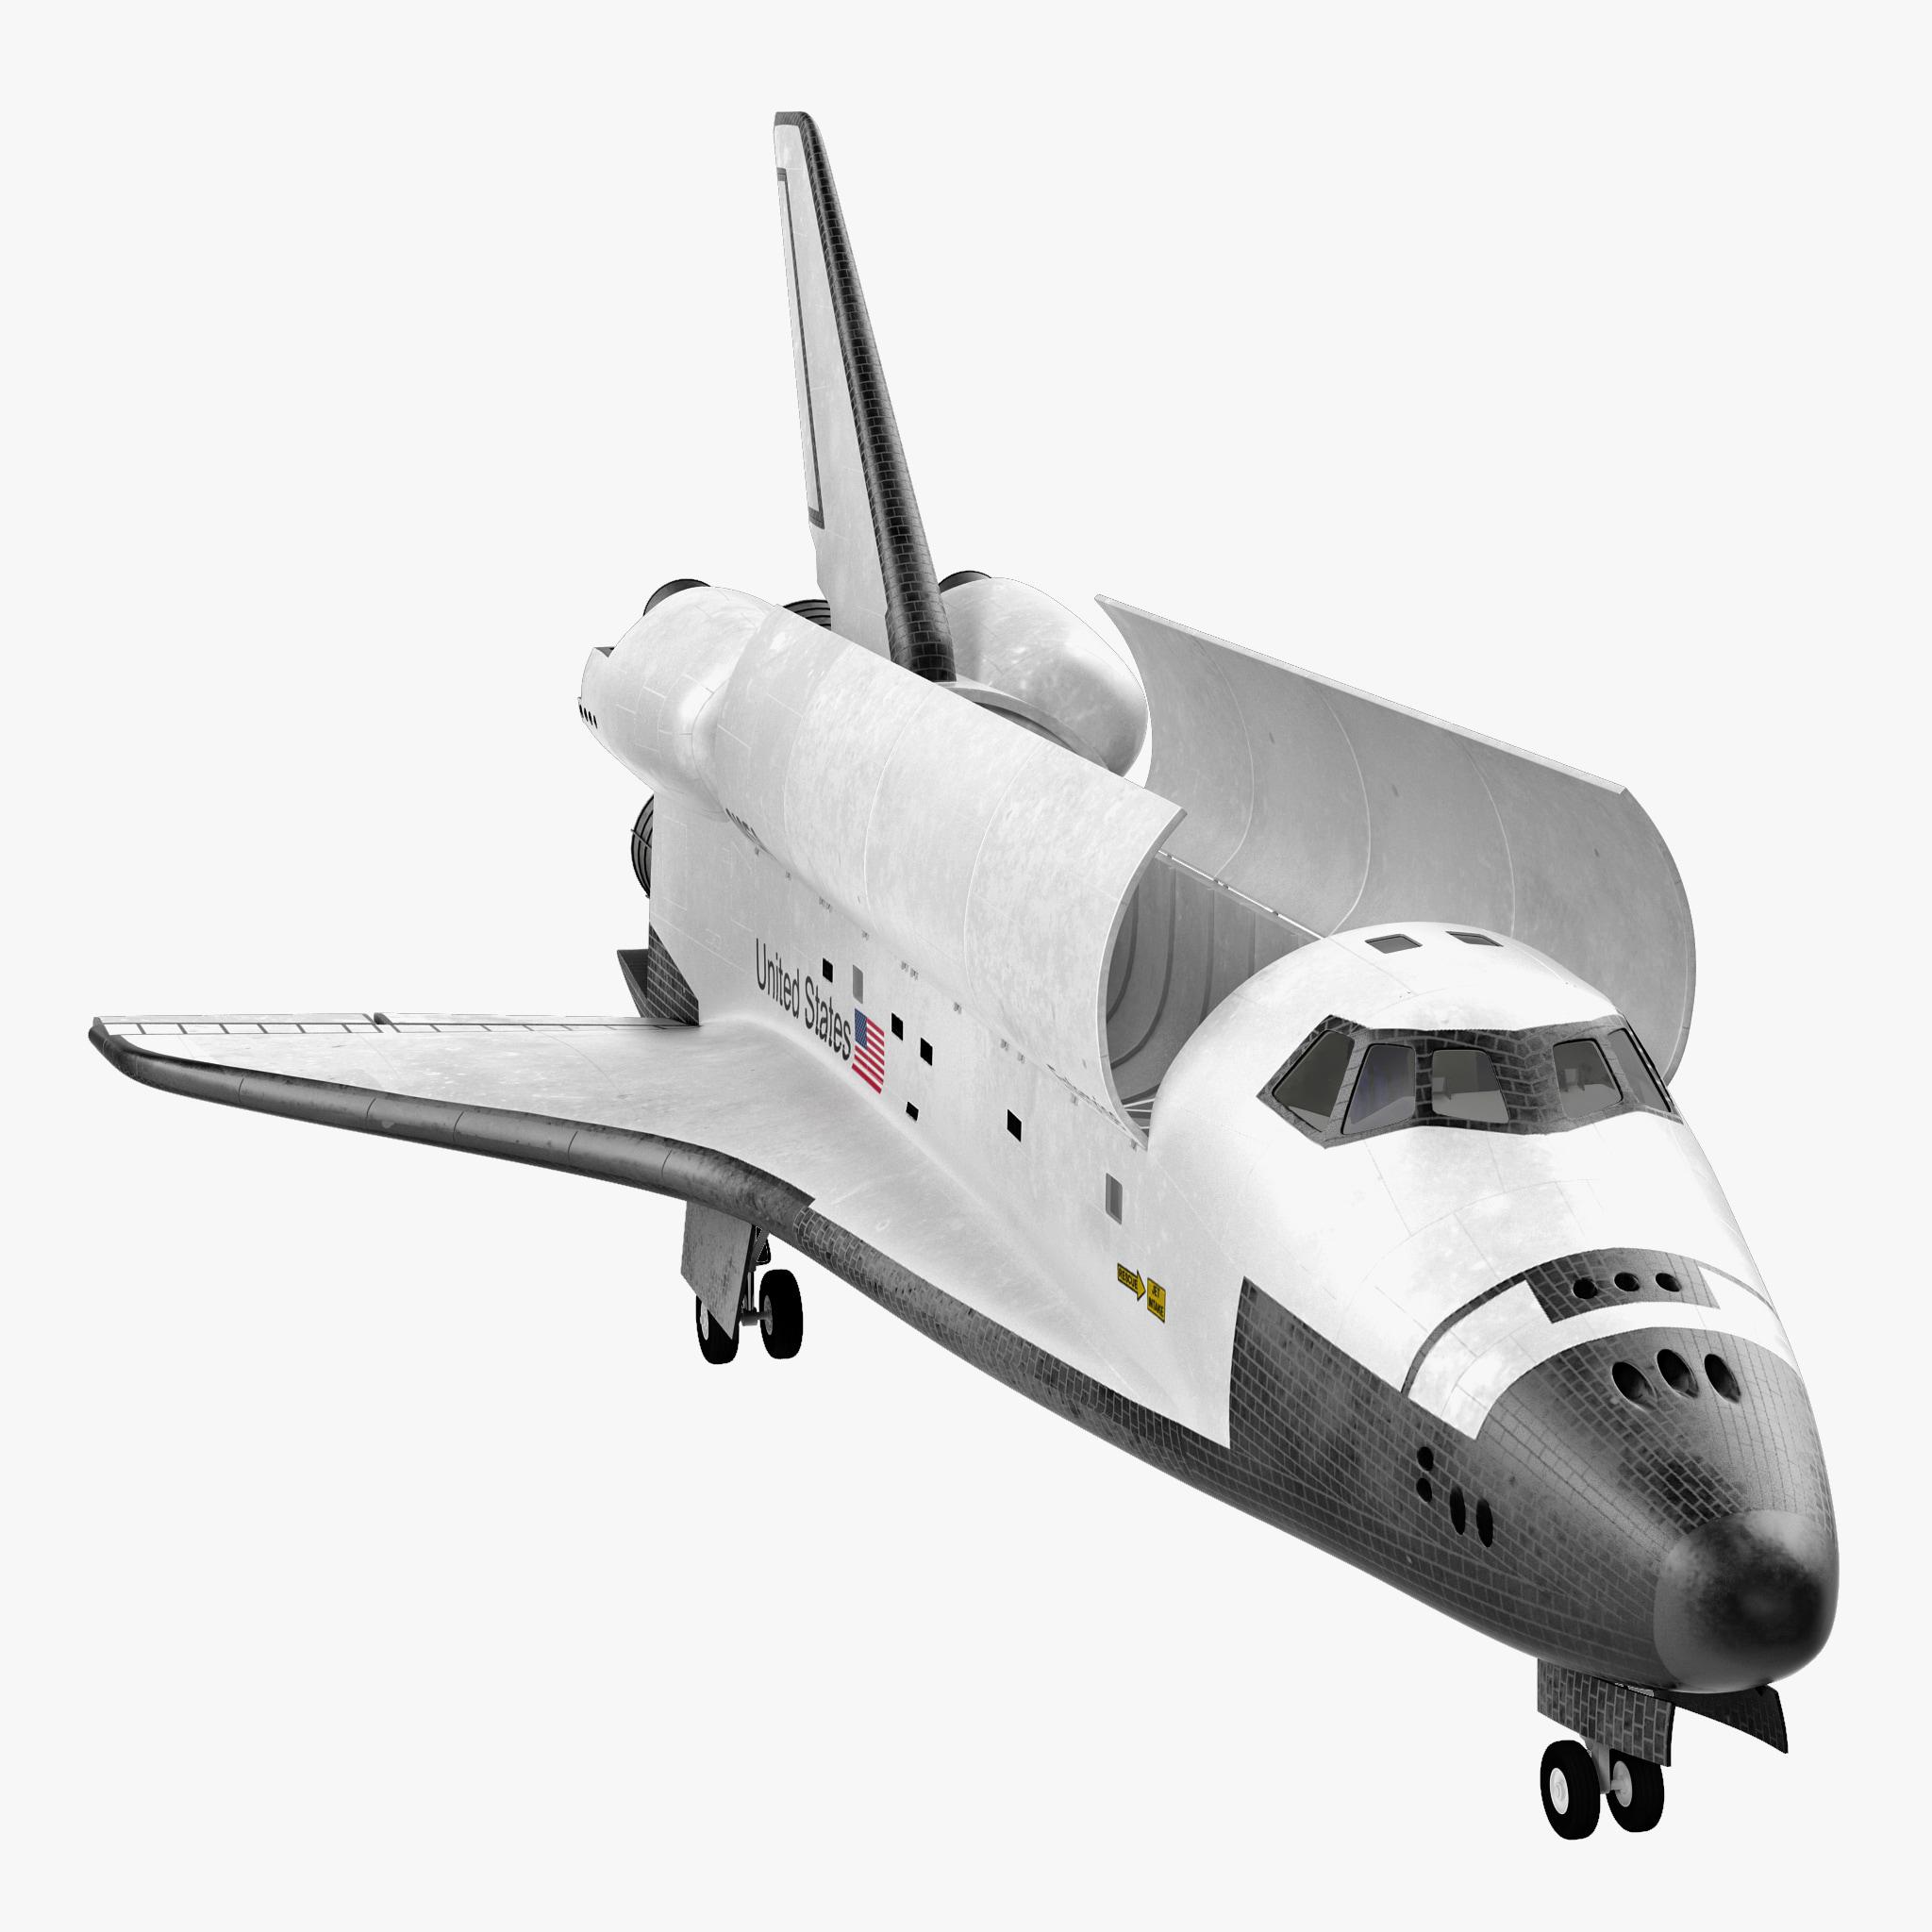 Space_Shuttle_Enterprise_Rigged___000.jpg